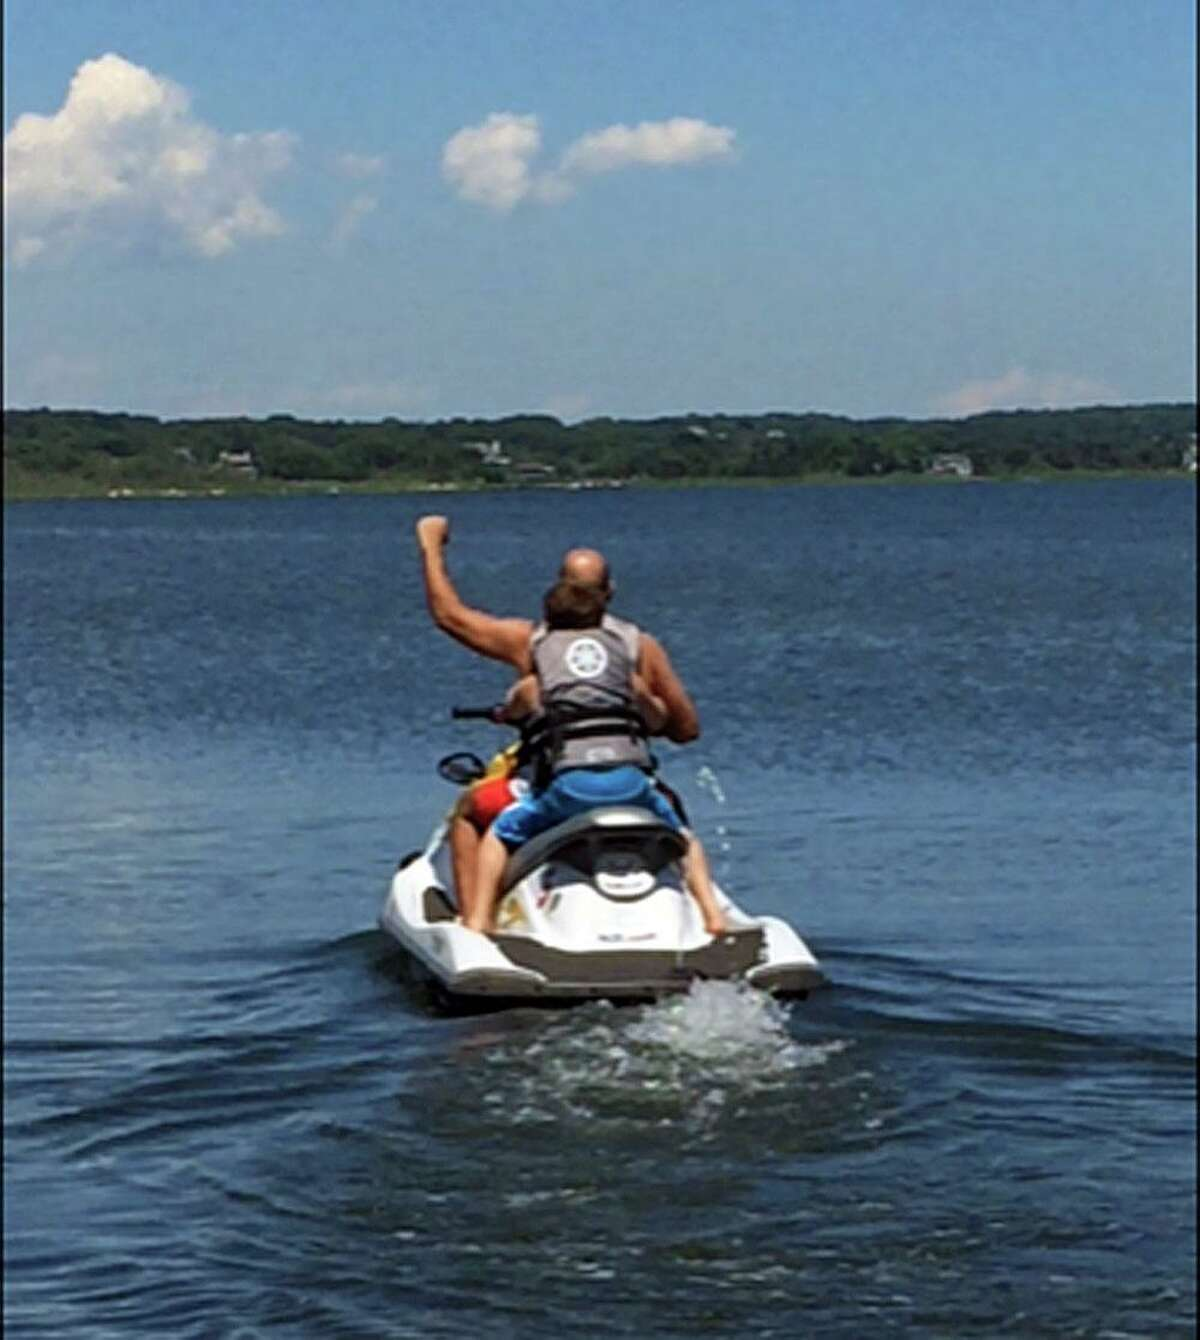 Vinnie Penn on jet skis with his son.